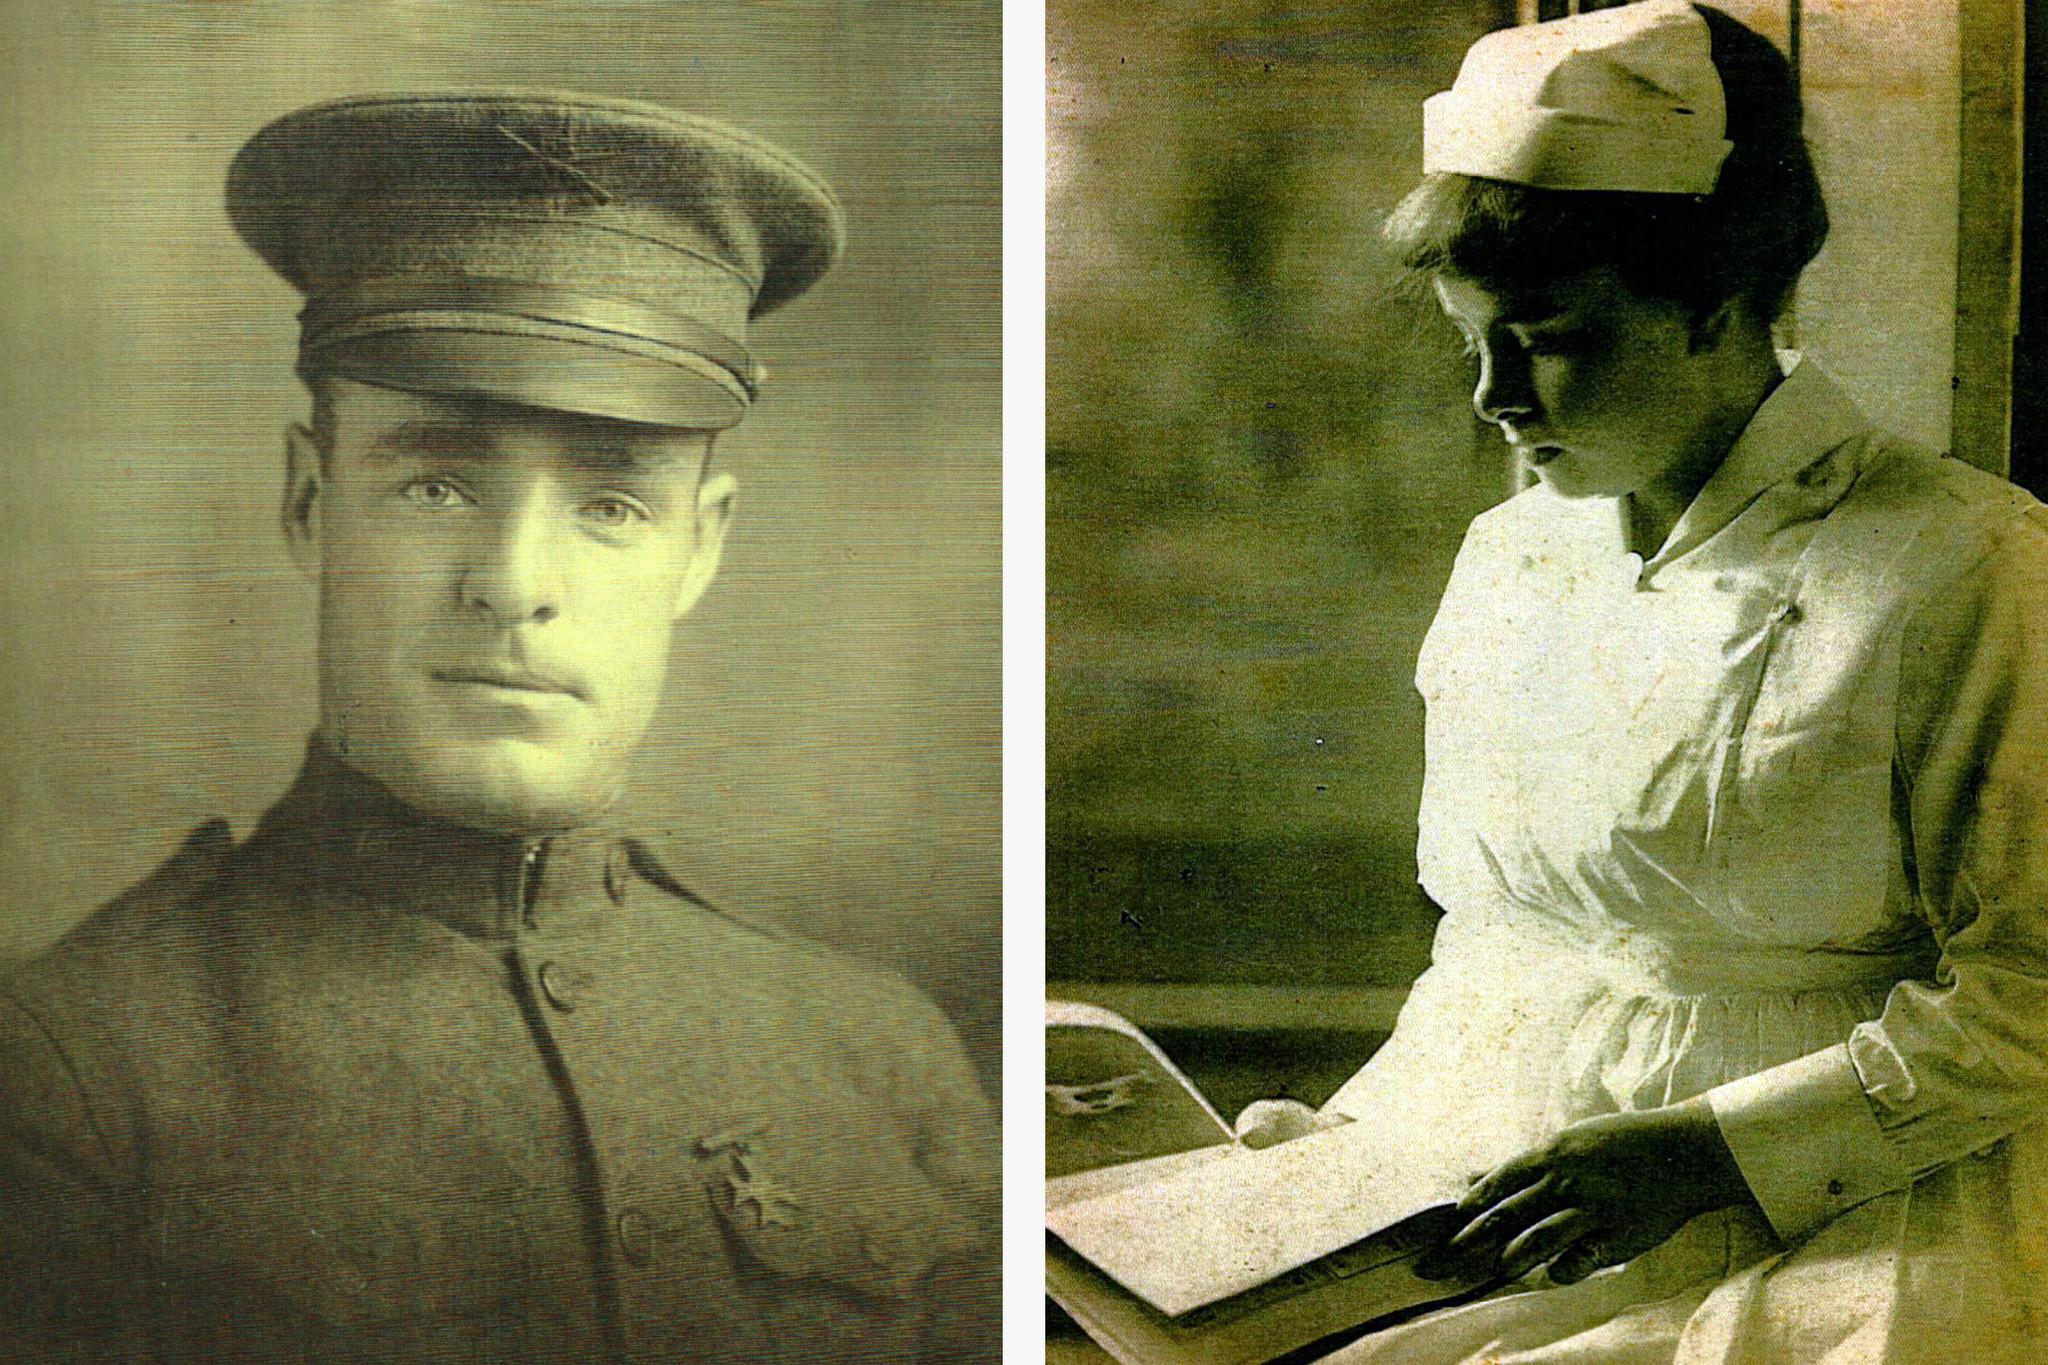 Warfare never the same 100 years after U.S. joins World War I